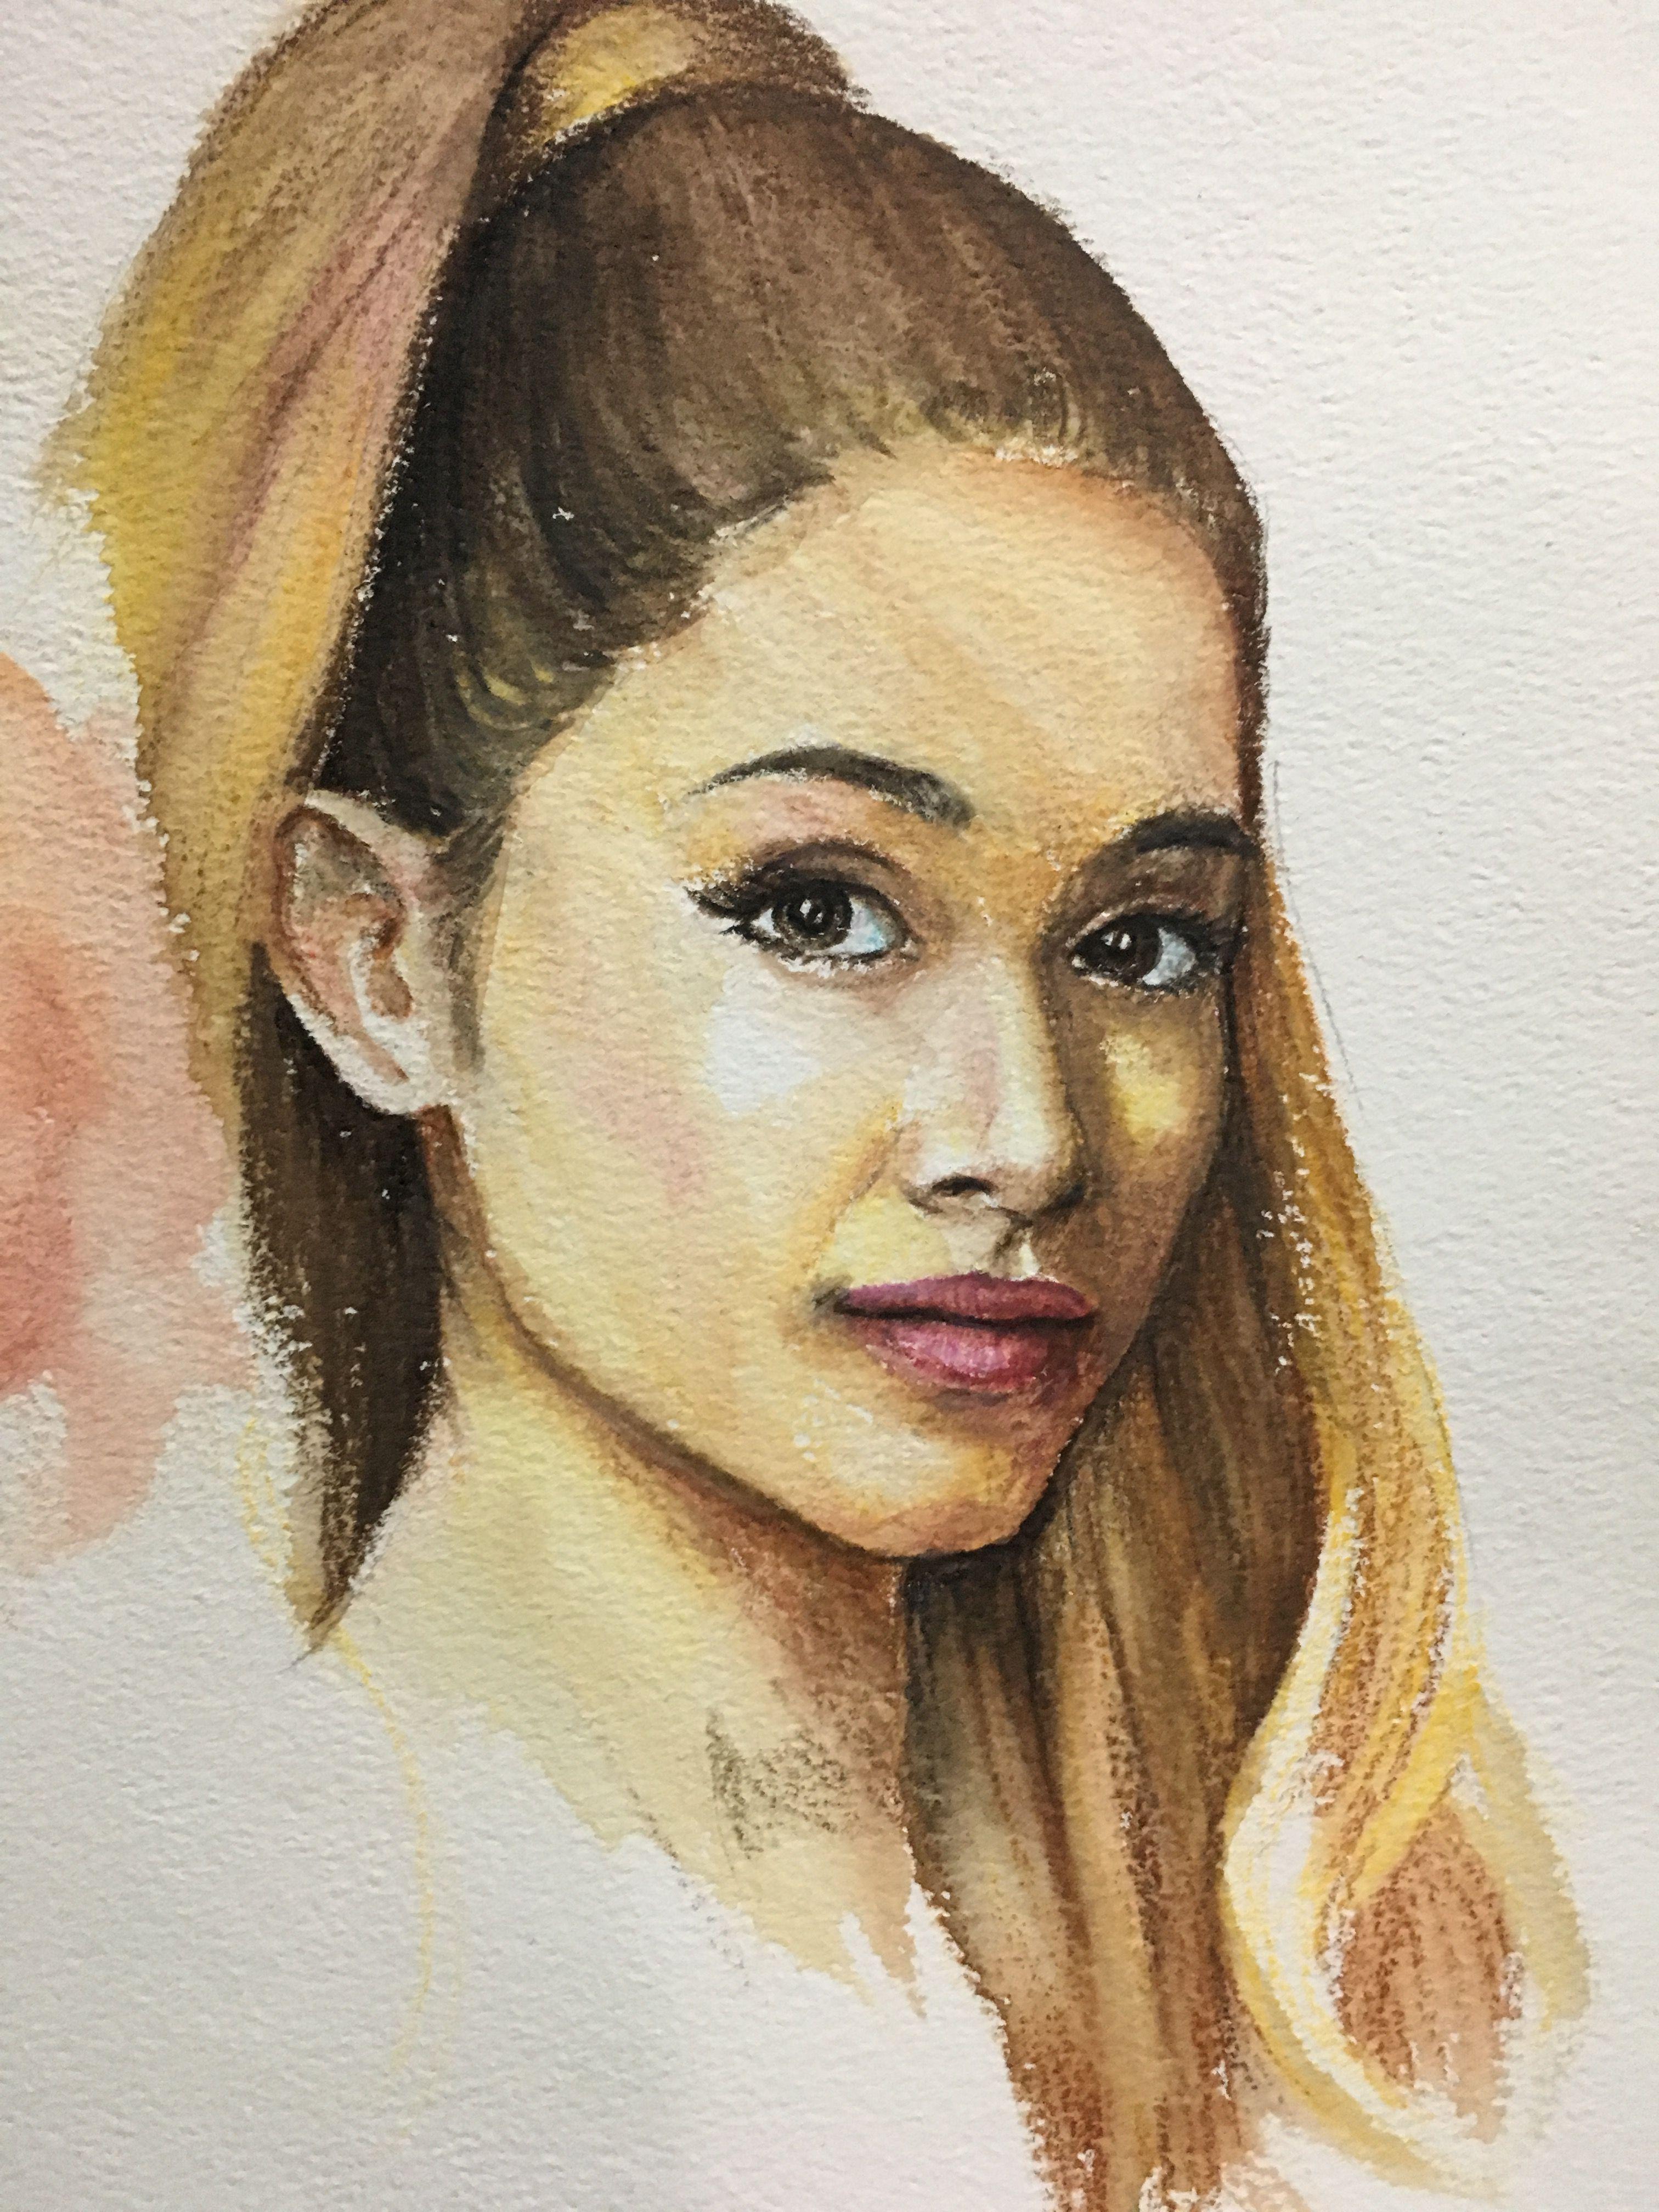 Ariana grande watercolor pencil portrait paintings in 2019